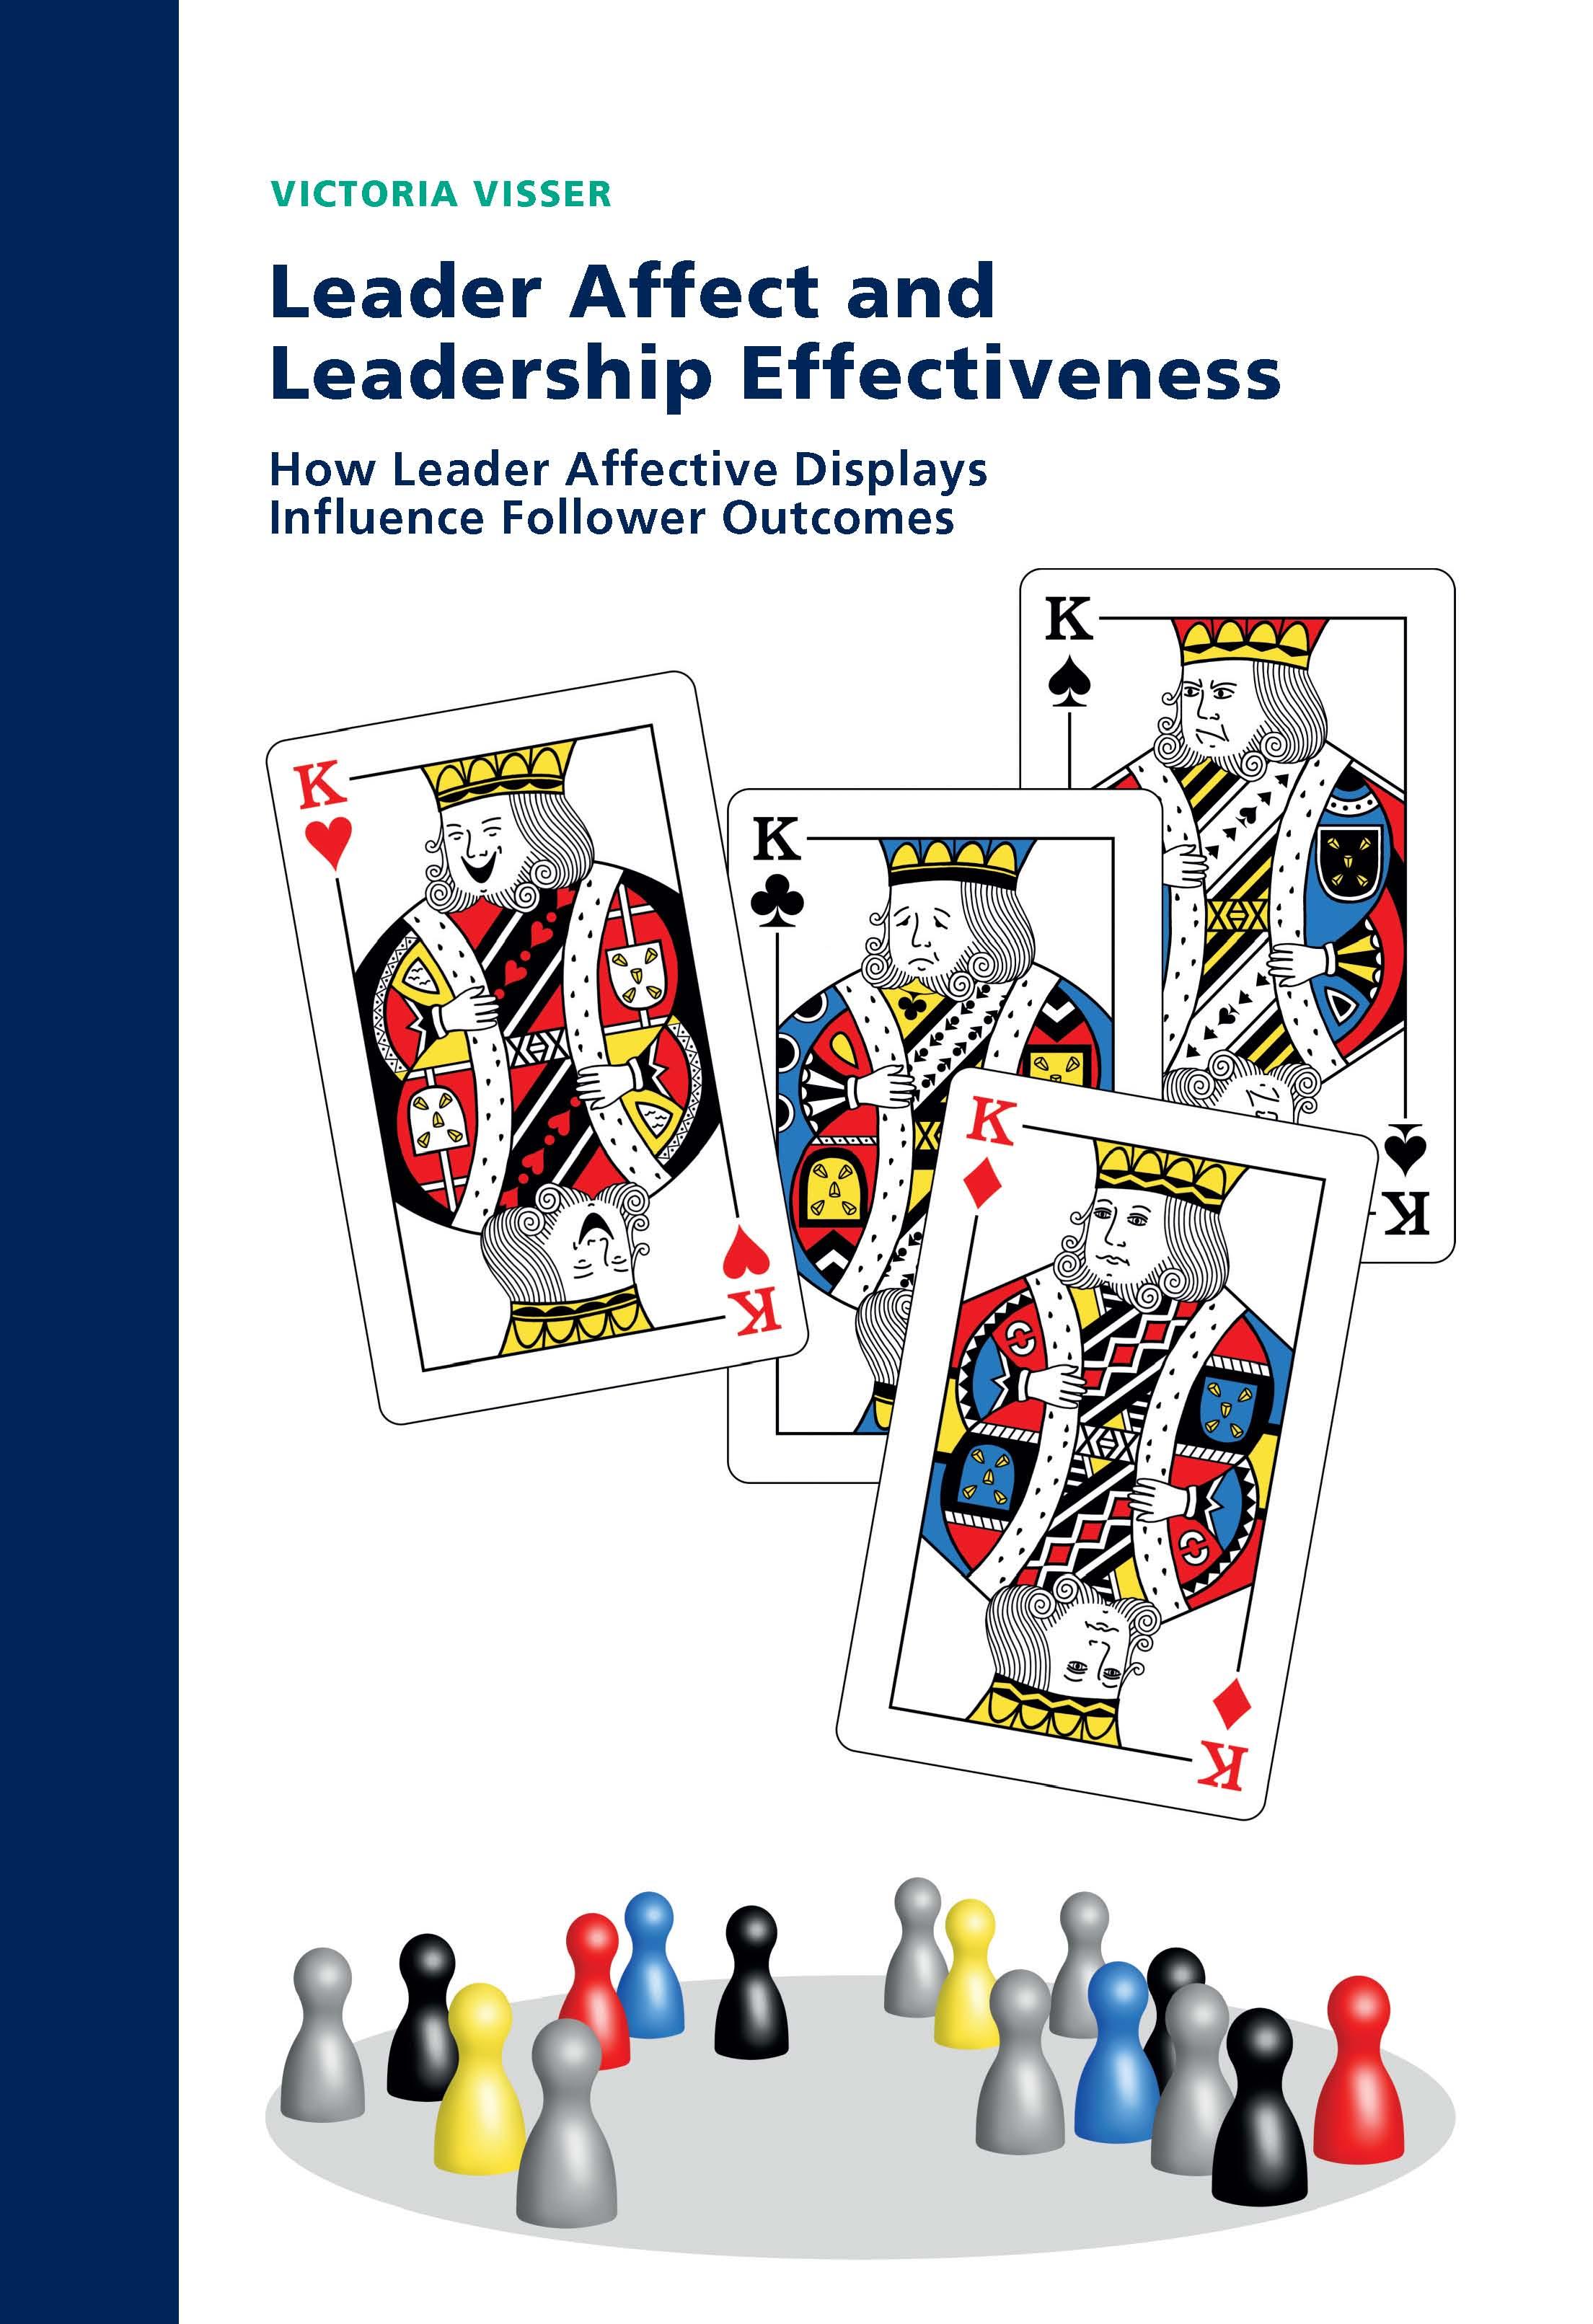 Dissertations (1999-Present) - School of Business & Leadership